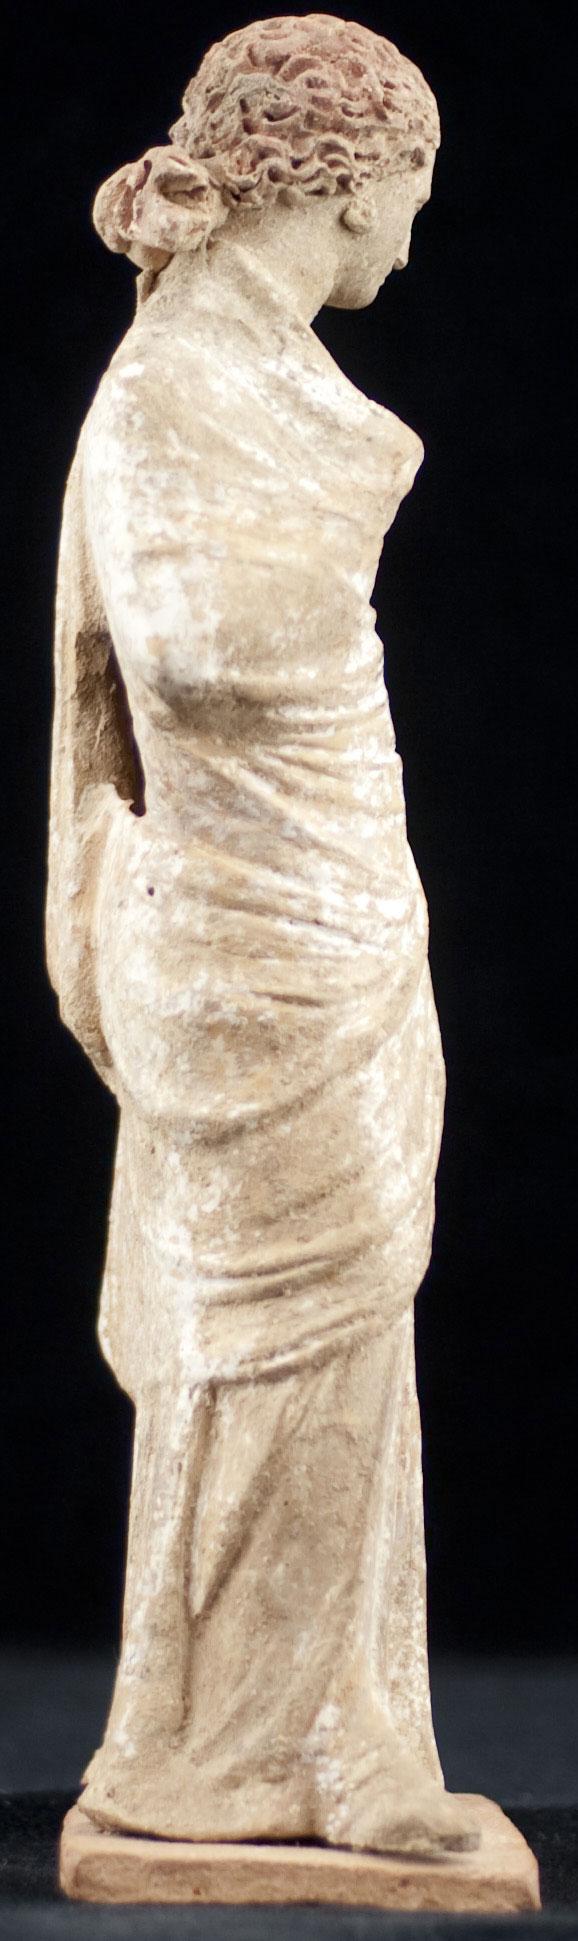 Tanagra Figure (354030)